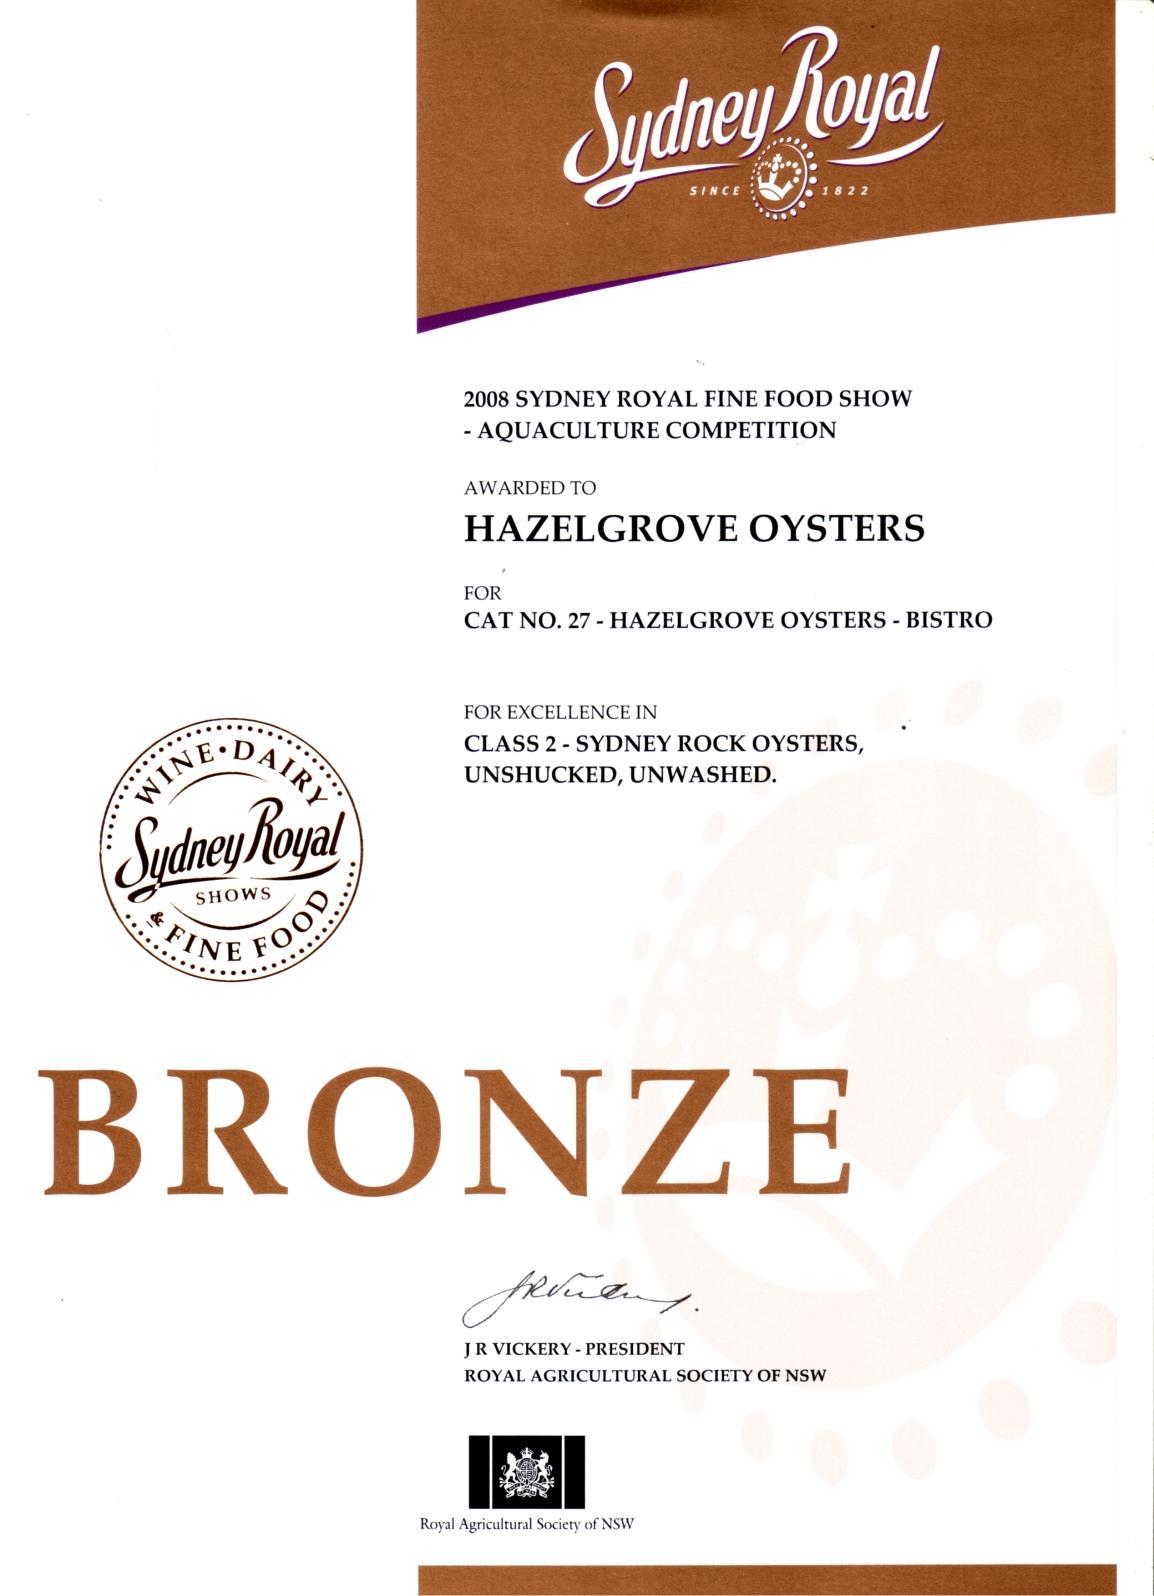 Bronze+2008